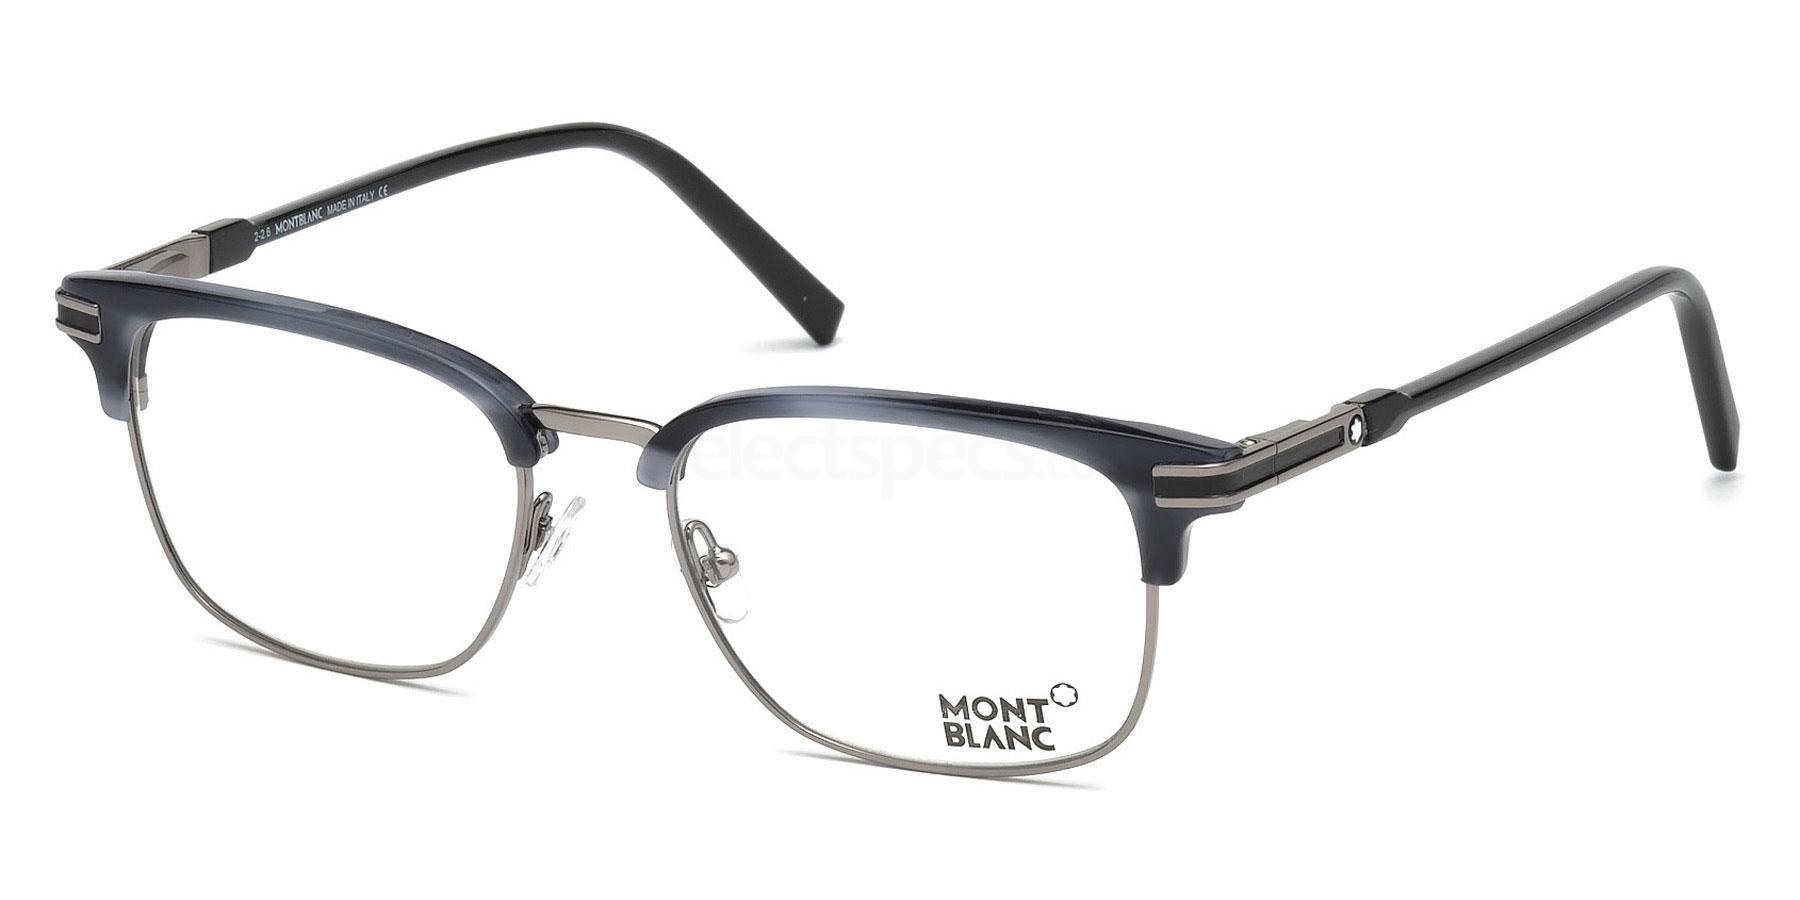 090 MB0669 Glasses, Mont Blanc